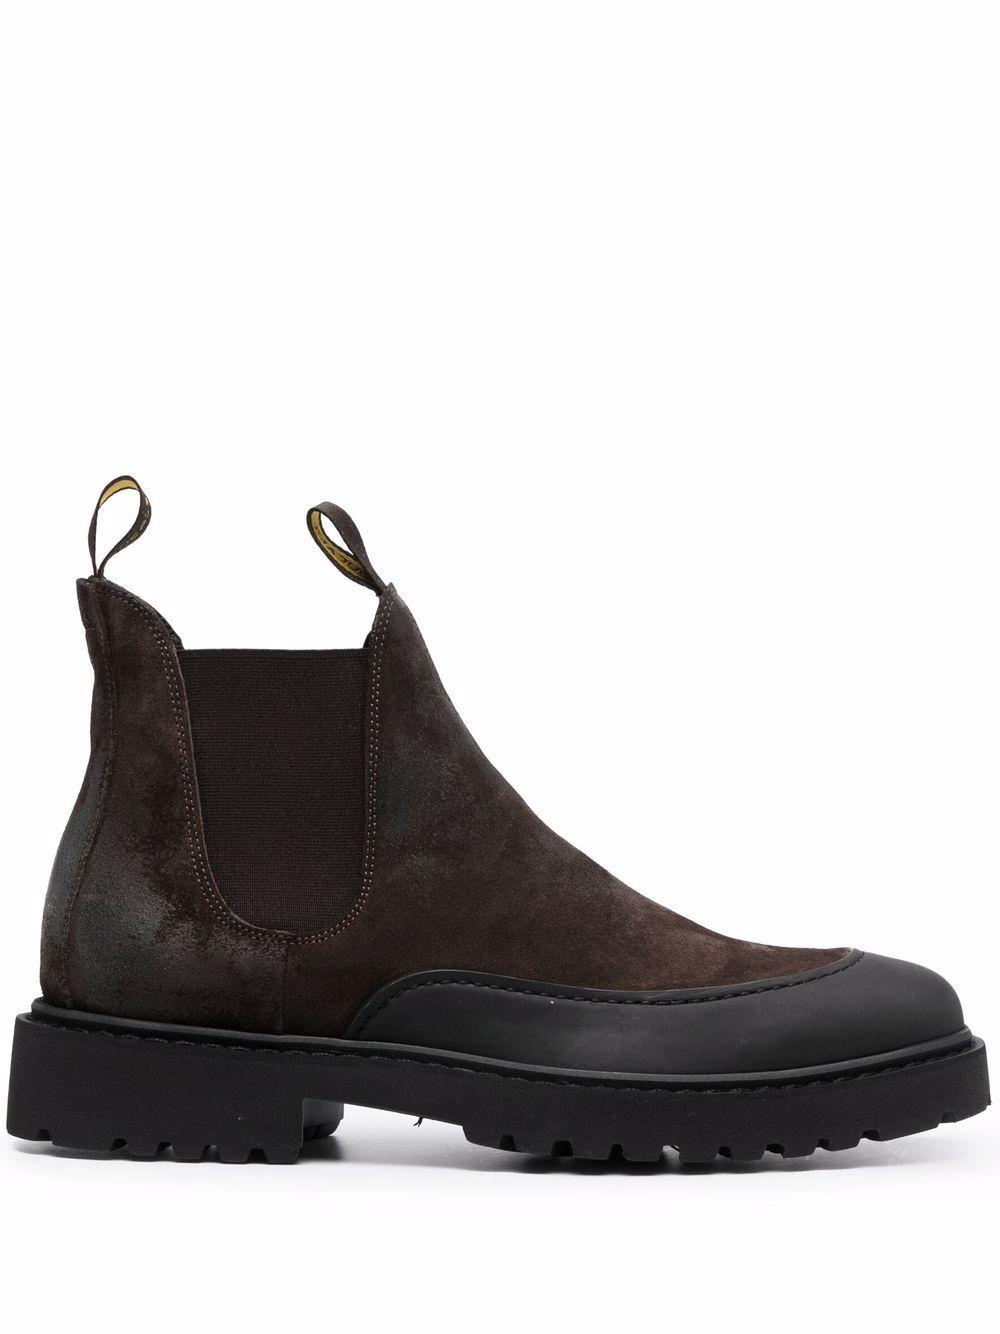 Doucal's stivali marrone